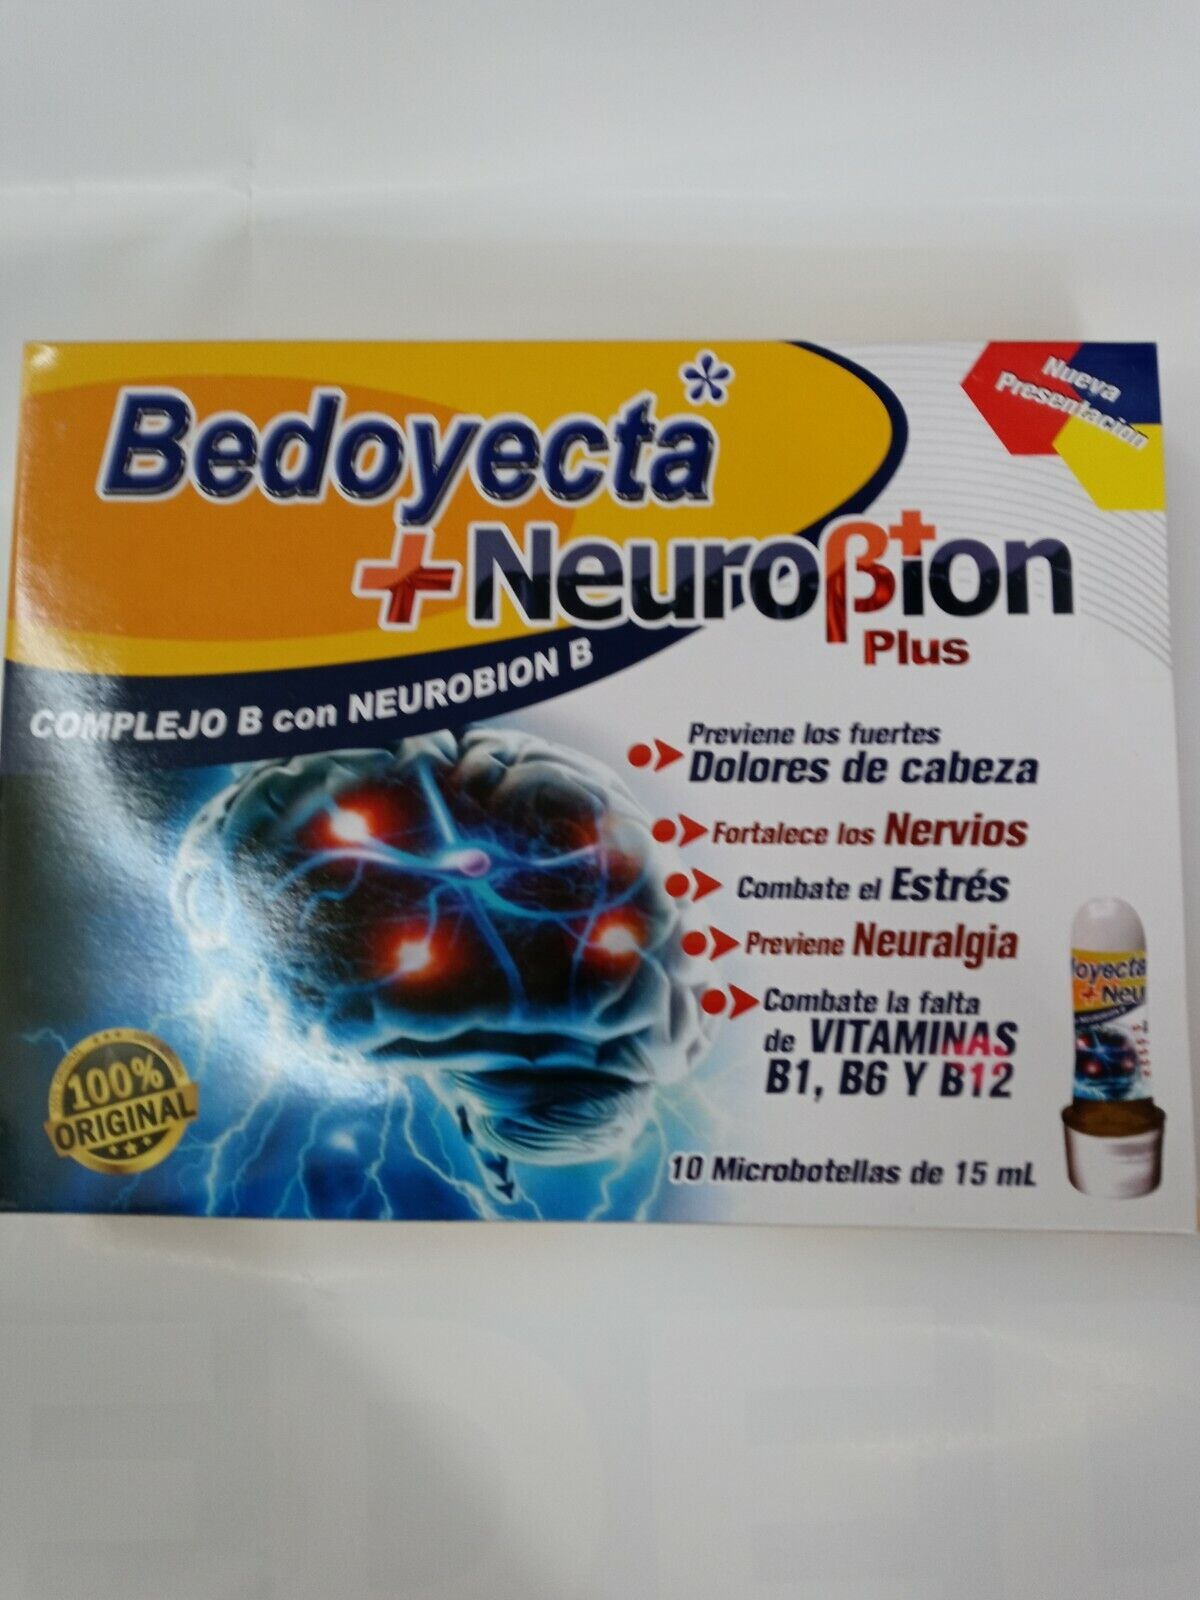 BEDOYECTA+ NEUROBION PLUS